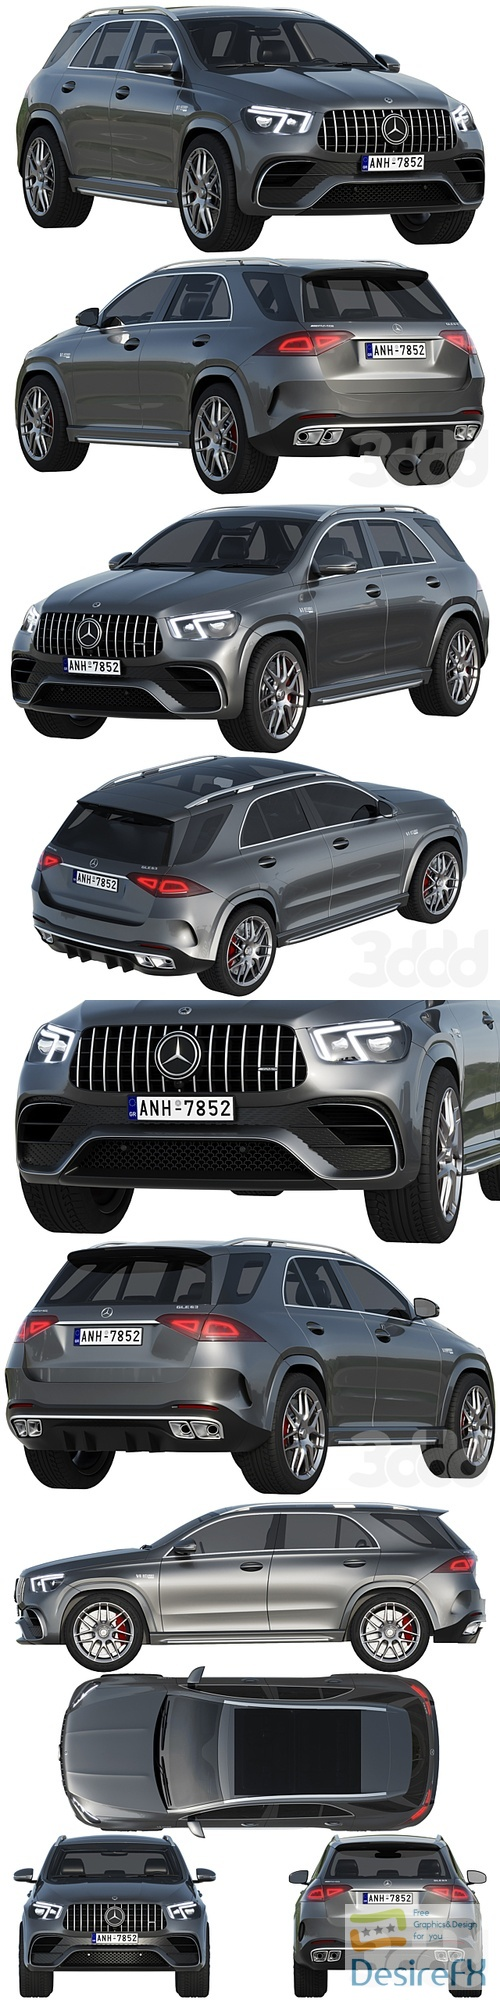 Mercedes-Benz AMG GLE 63 2021 3D Model